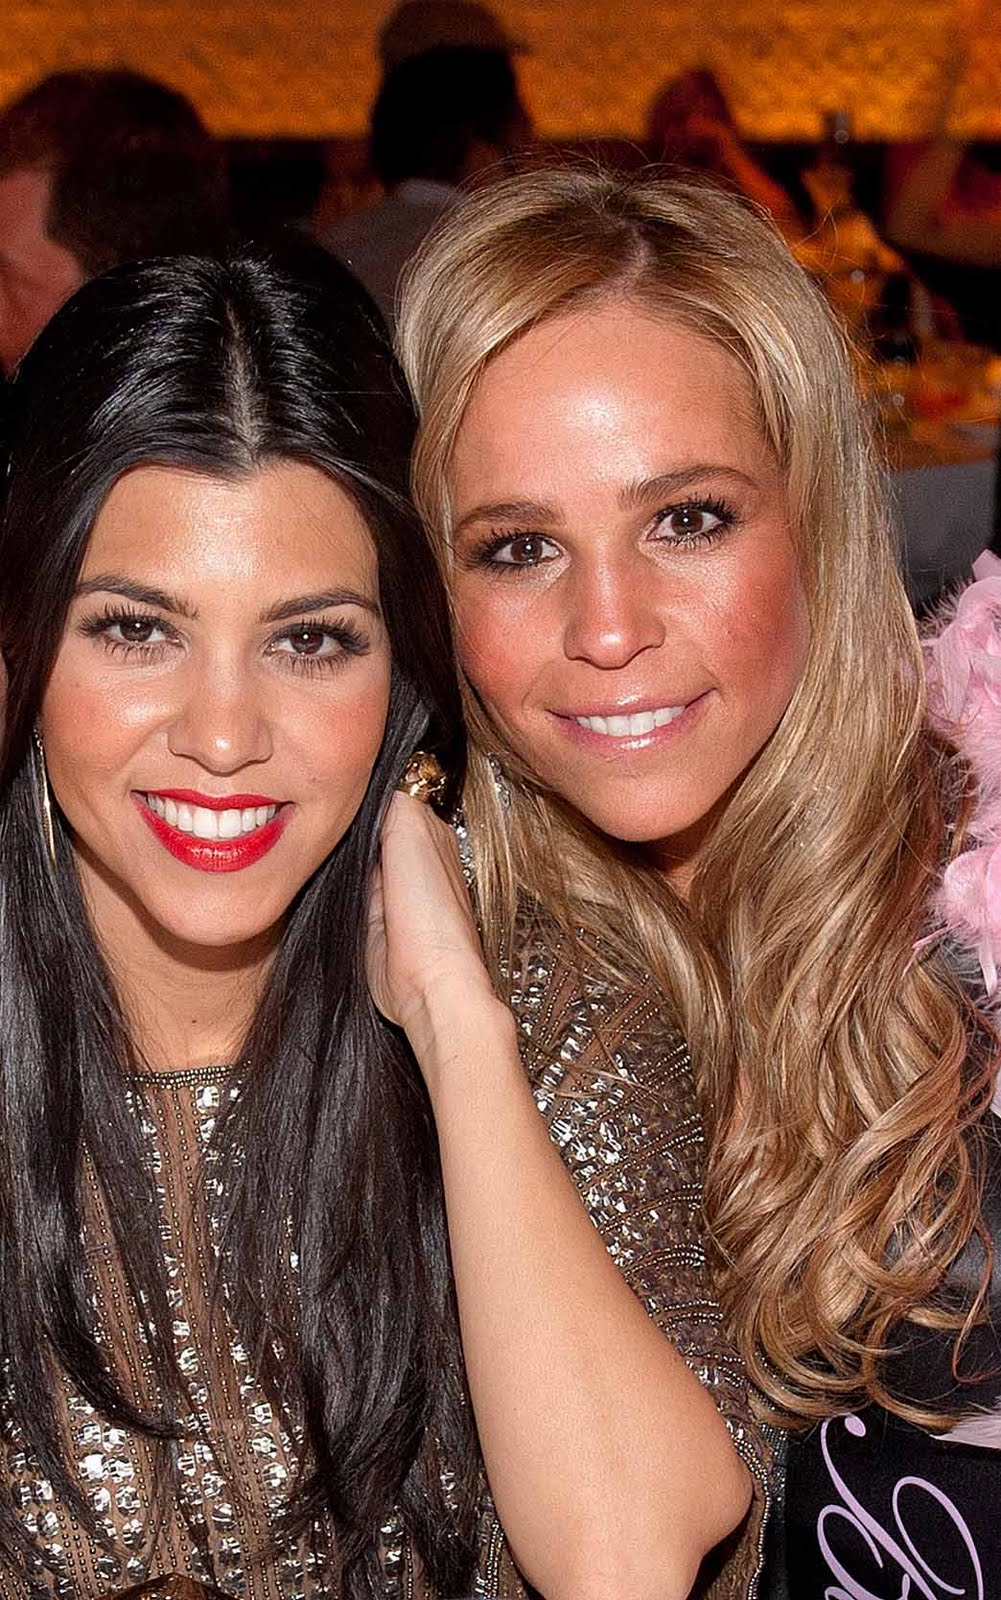 Photo of Kourtney Kardashian & her friend  Alison Shulman